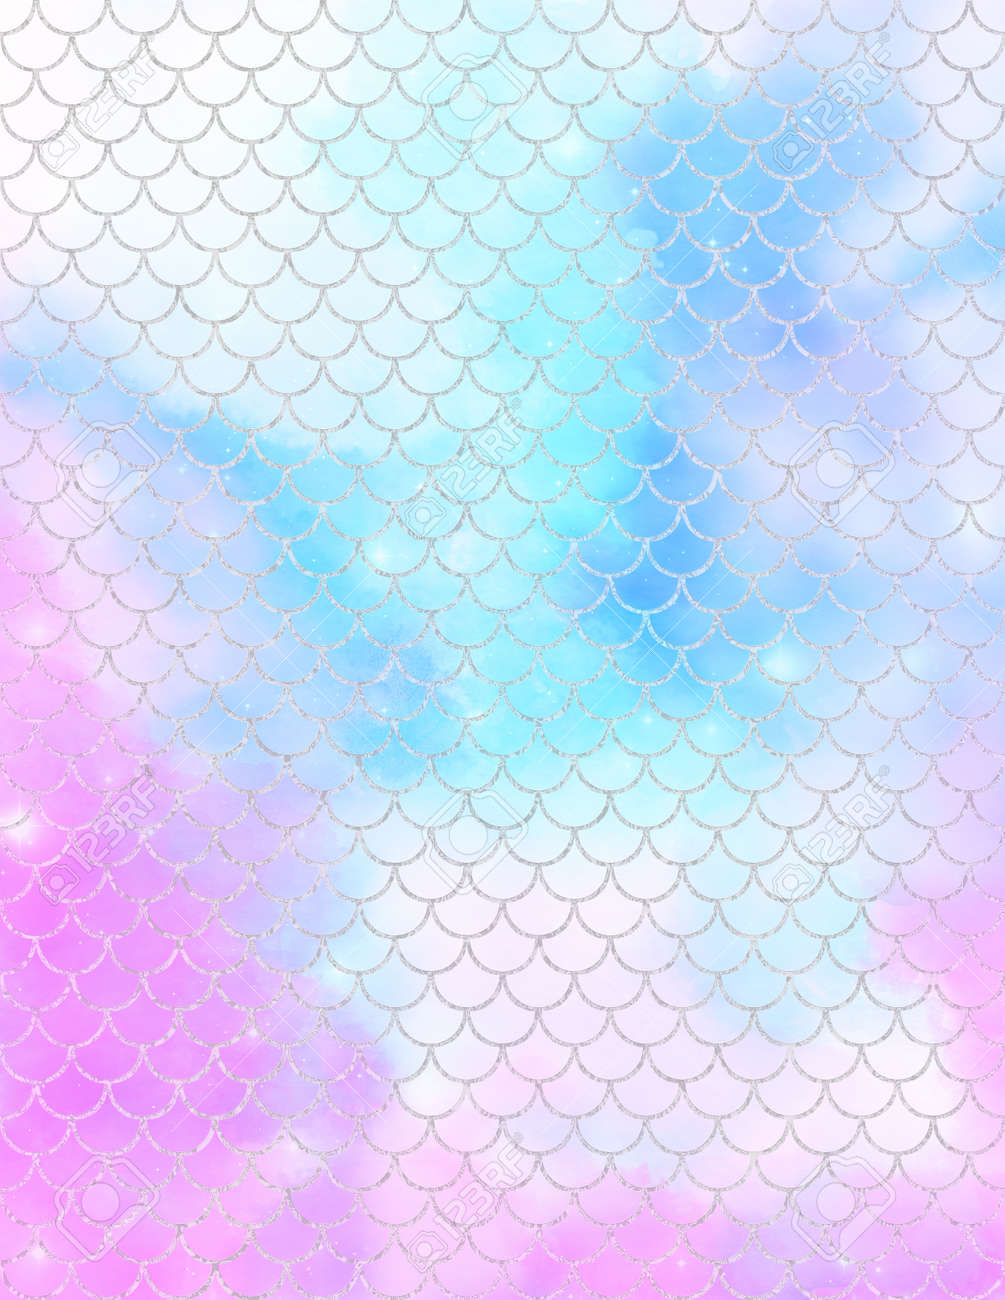 Mermaid scale digital paper, Colorful pastel watercolor texture covers set. - 169697626